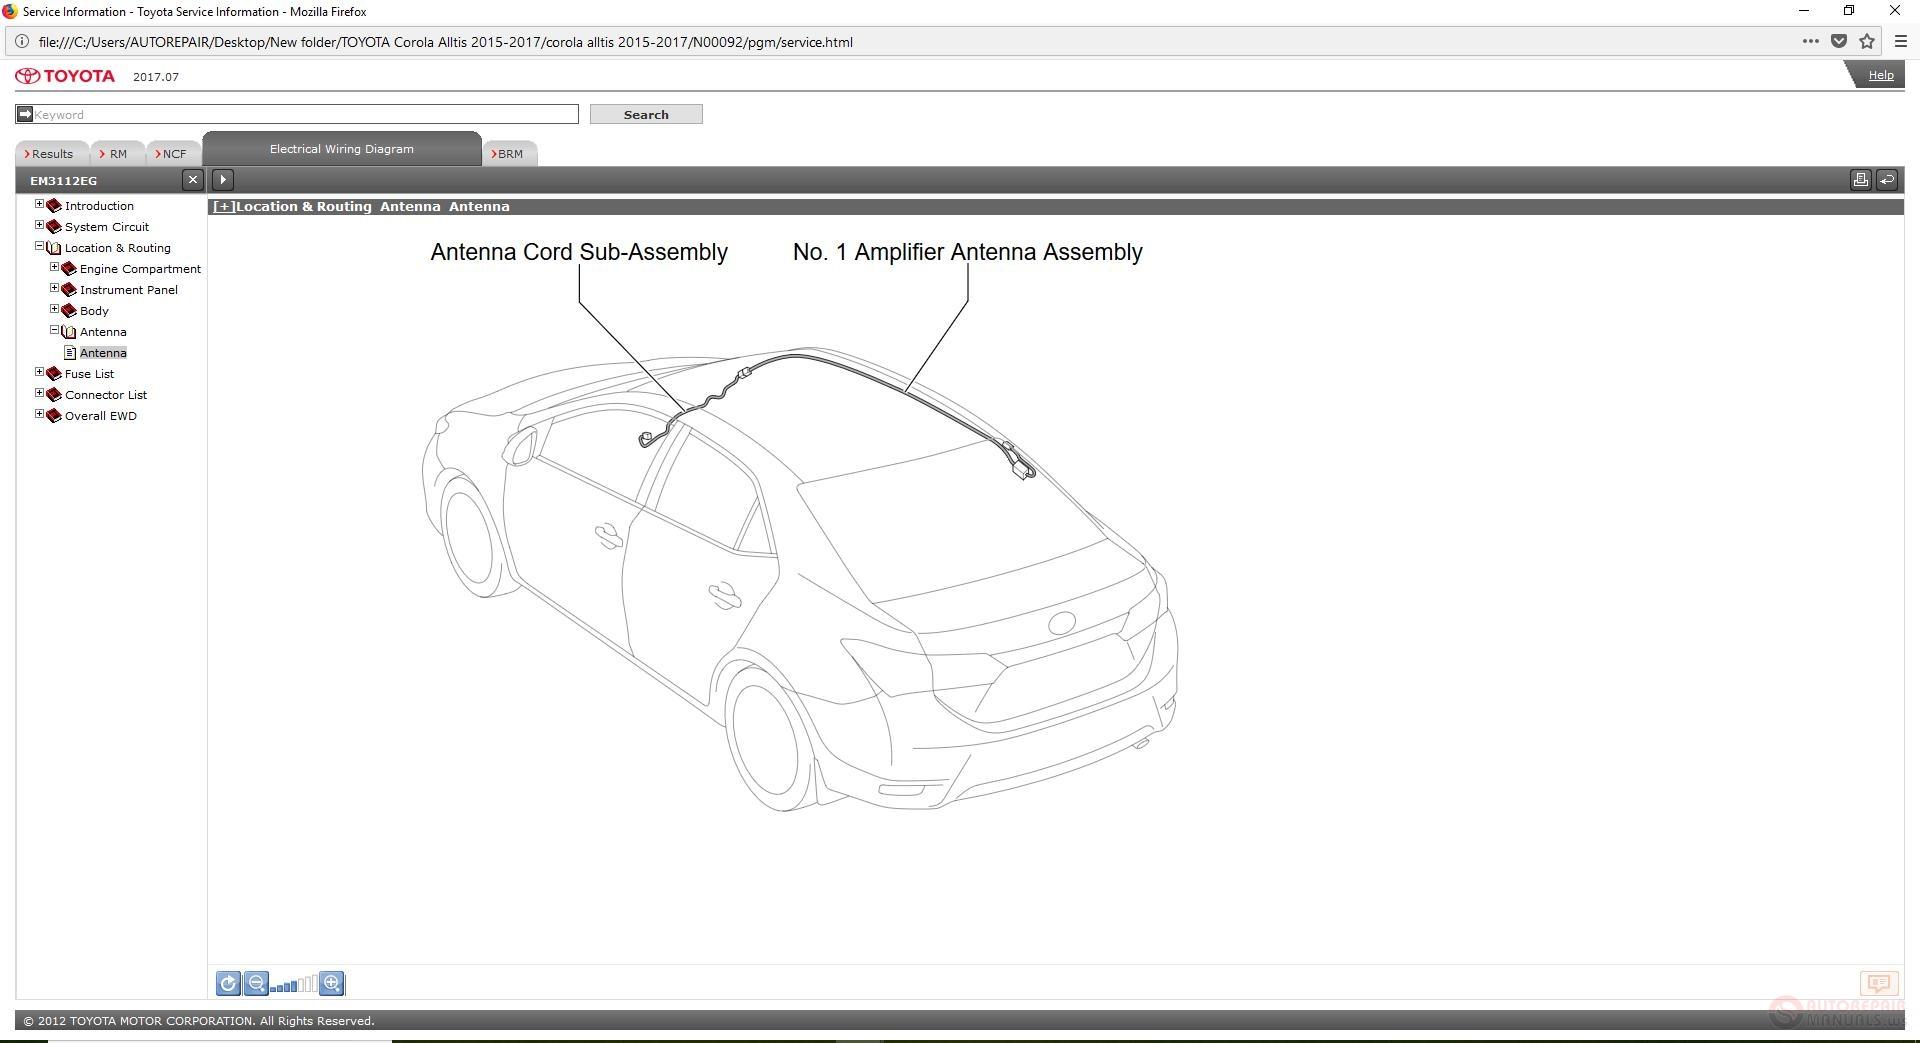 Toyota Corola Alltis Workshop Manual